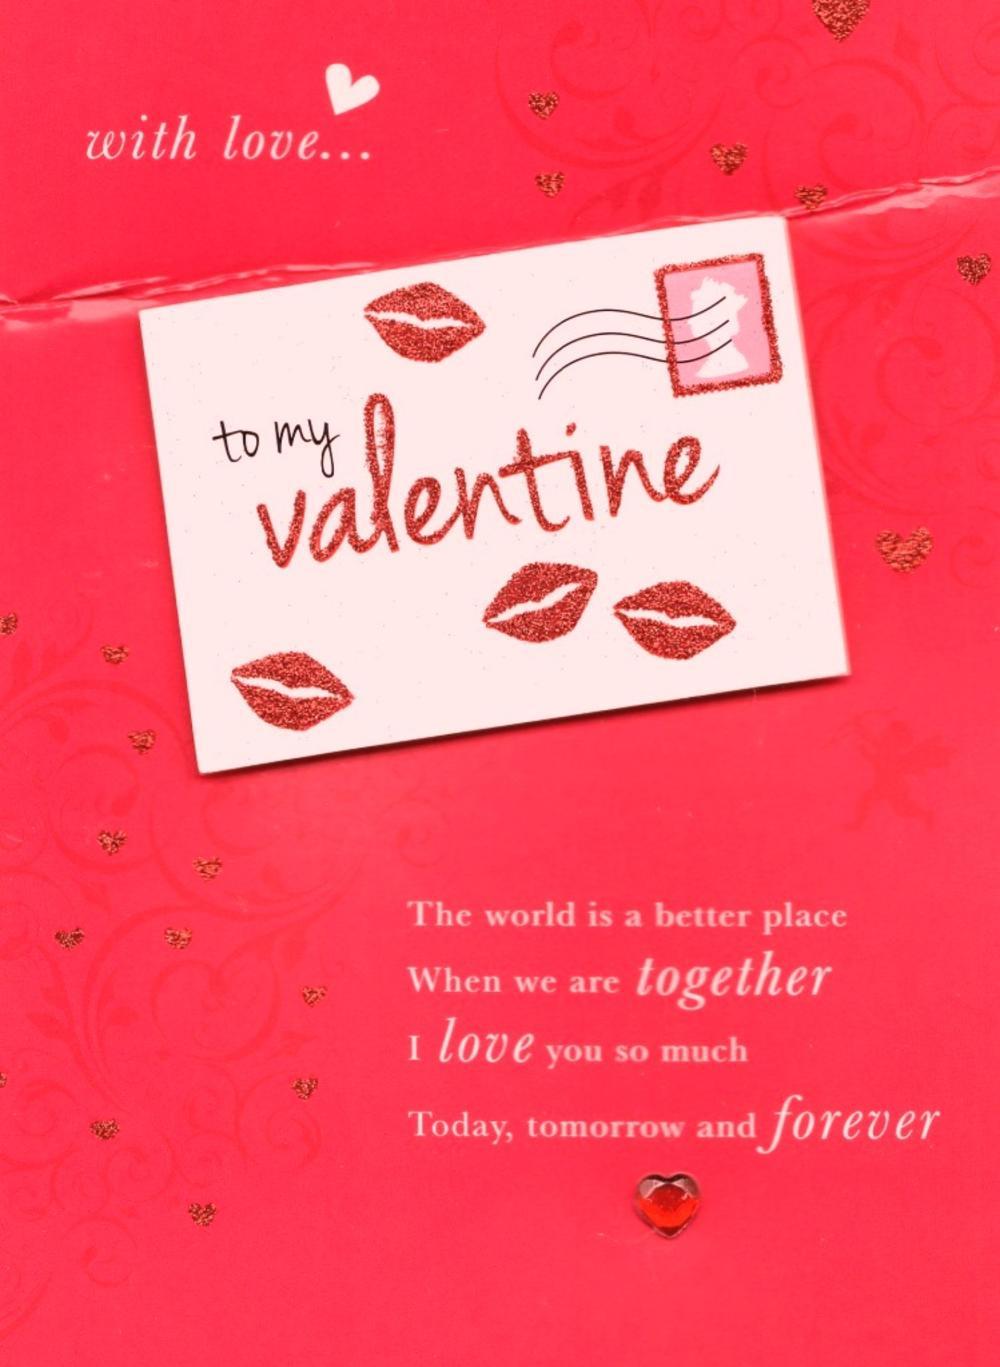 To My Valentine Valentine's Day Greeting Card